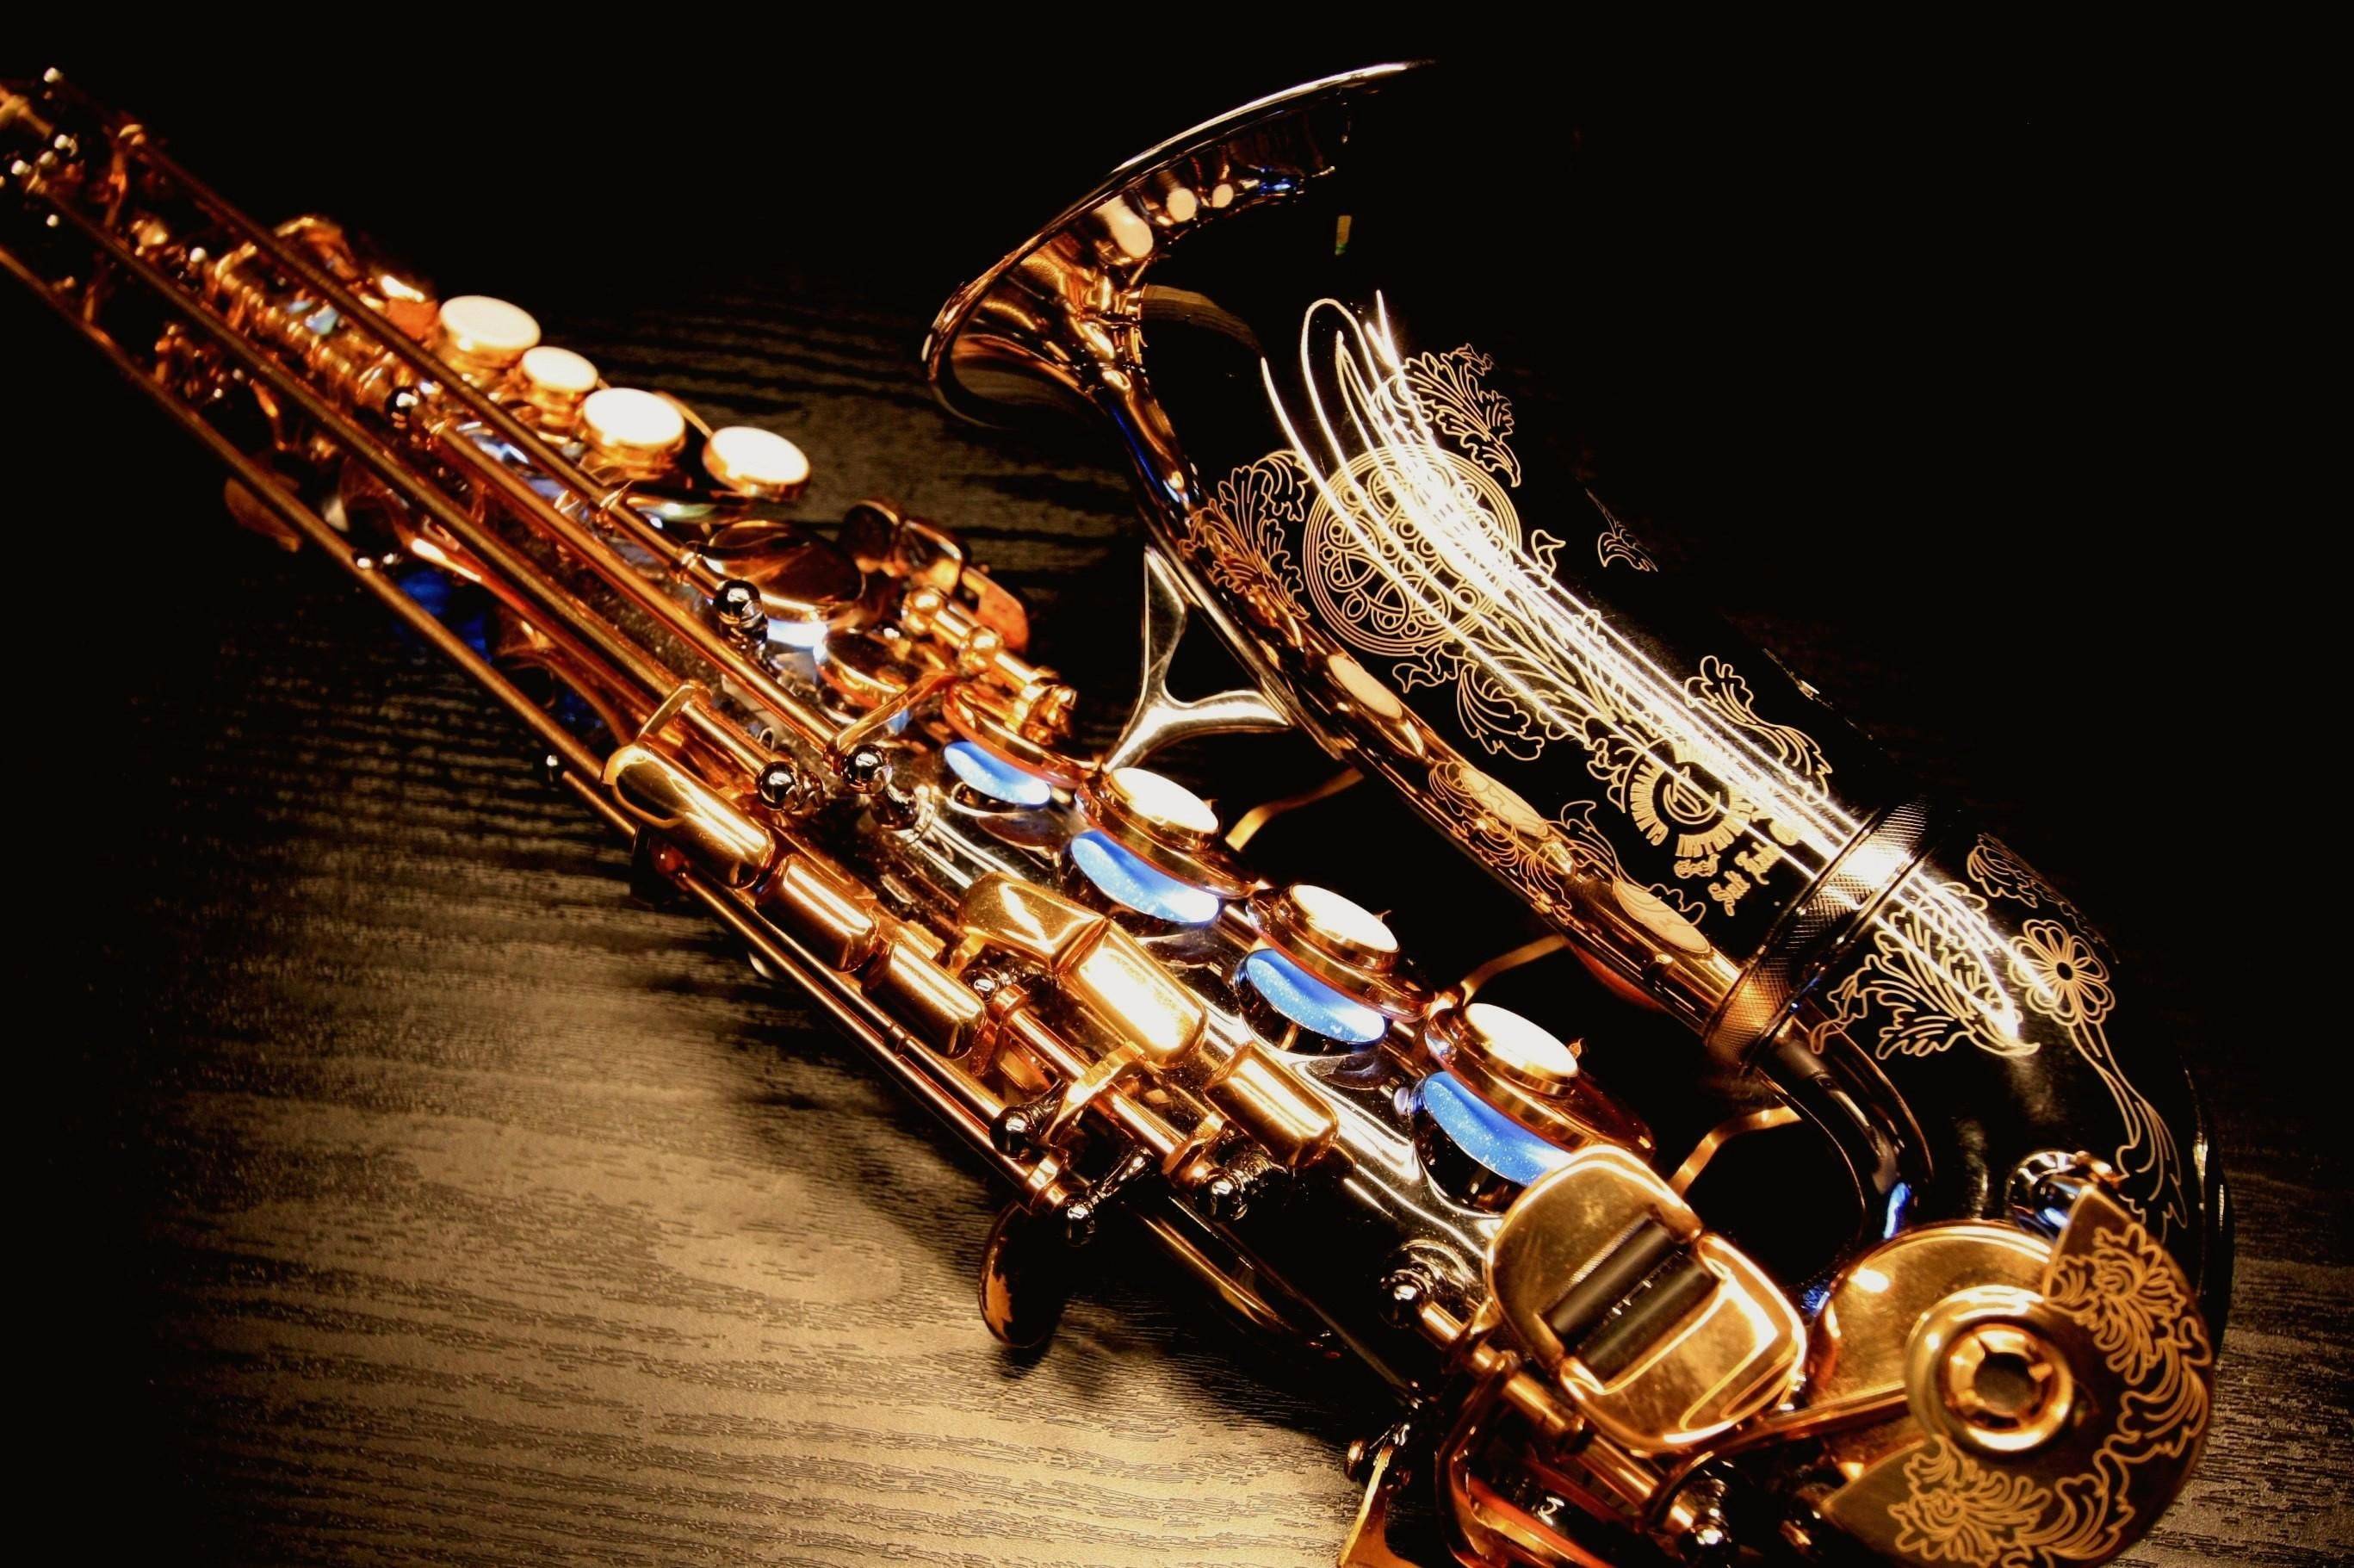 Saxophone Wallpaper Phone For Desktop Wallpaper 2734 x 1821 px 1.46 MB jazz art trumpet band saxophone widescreen desktop